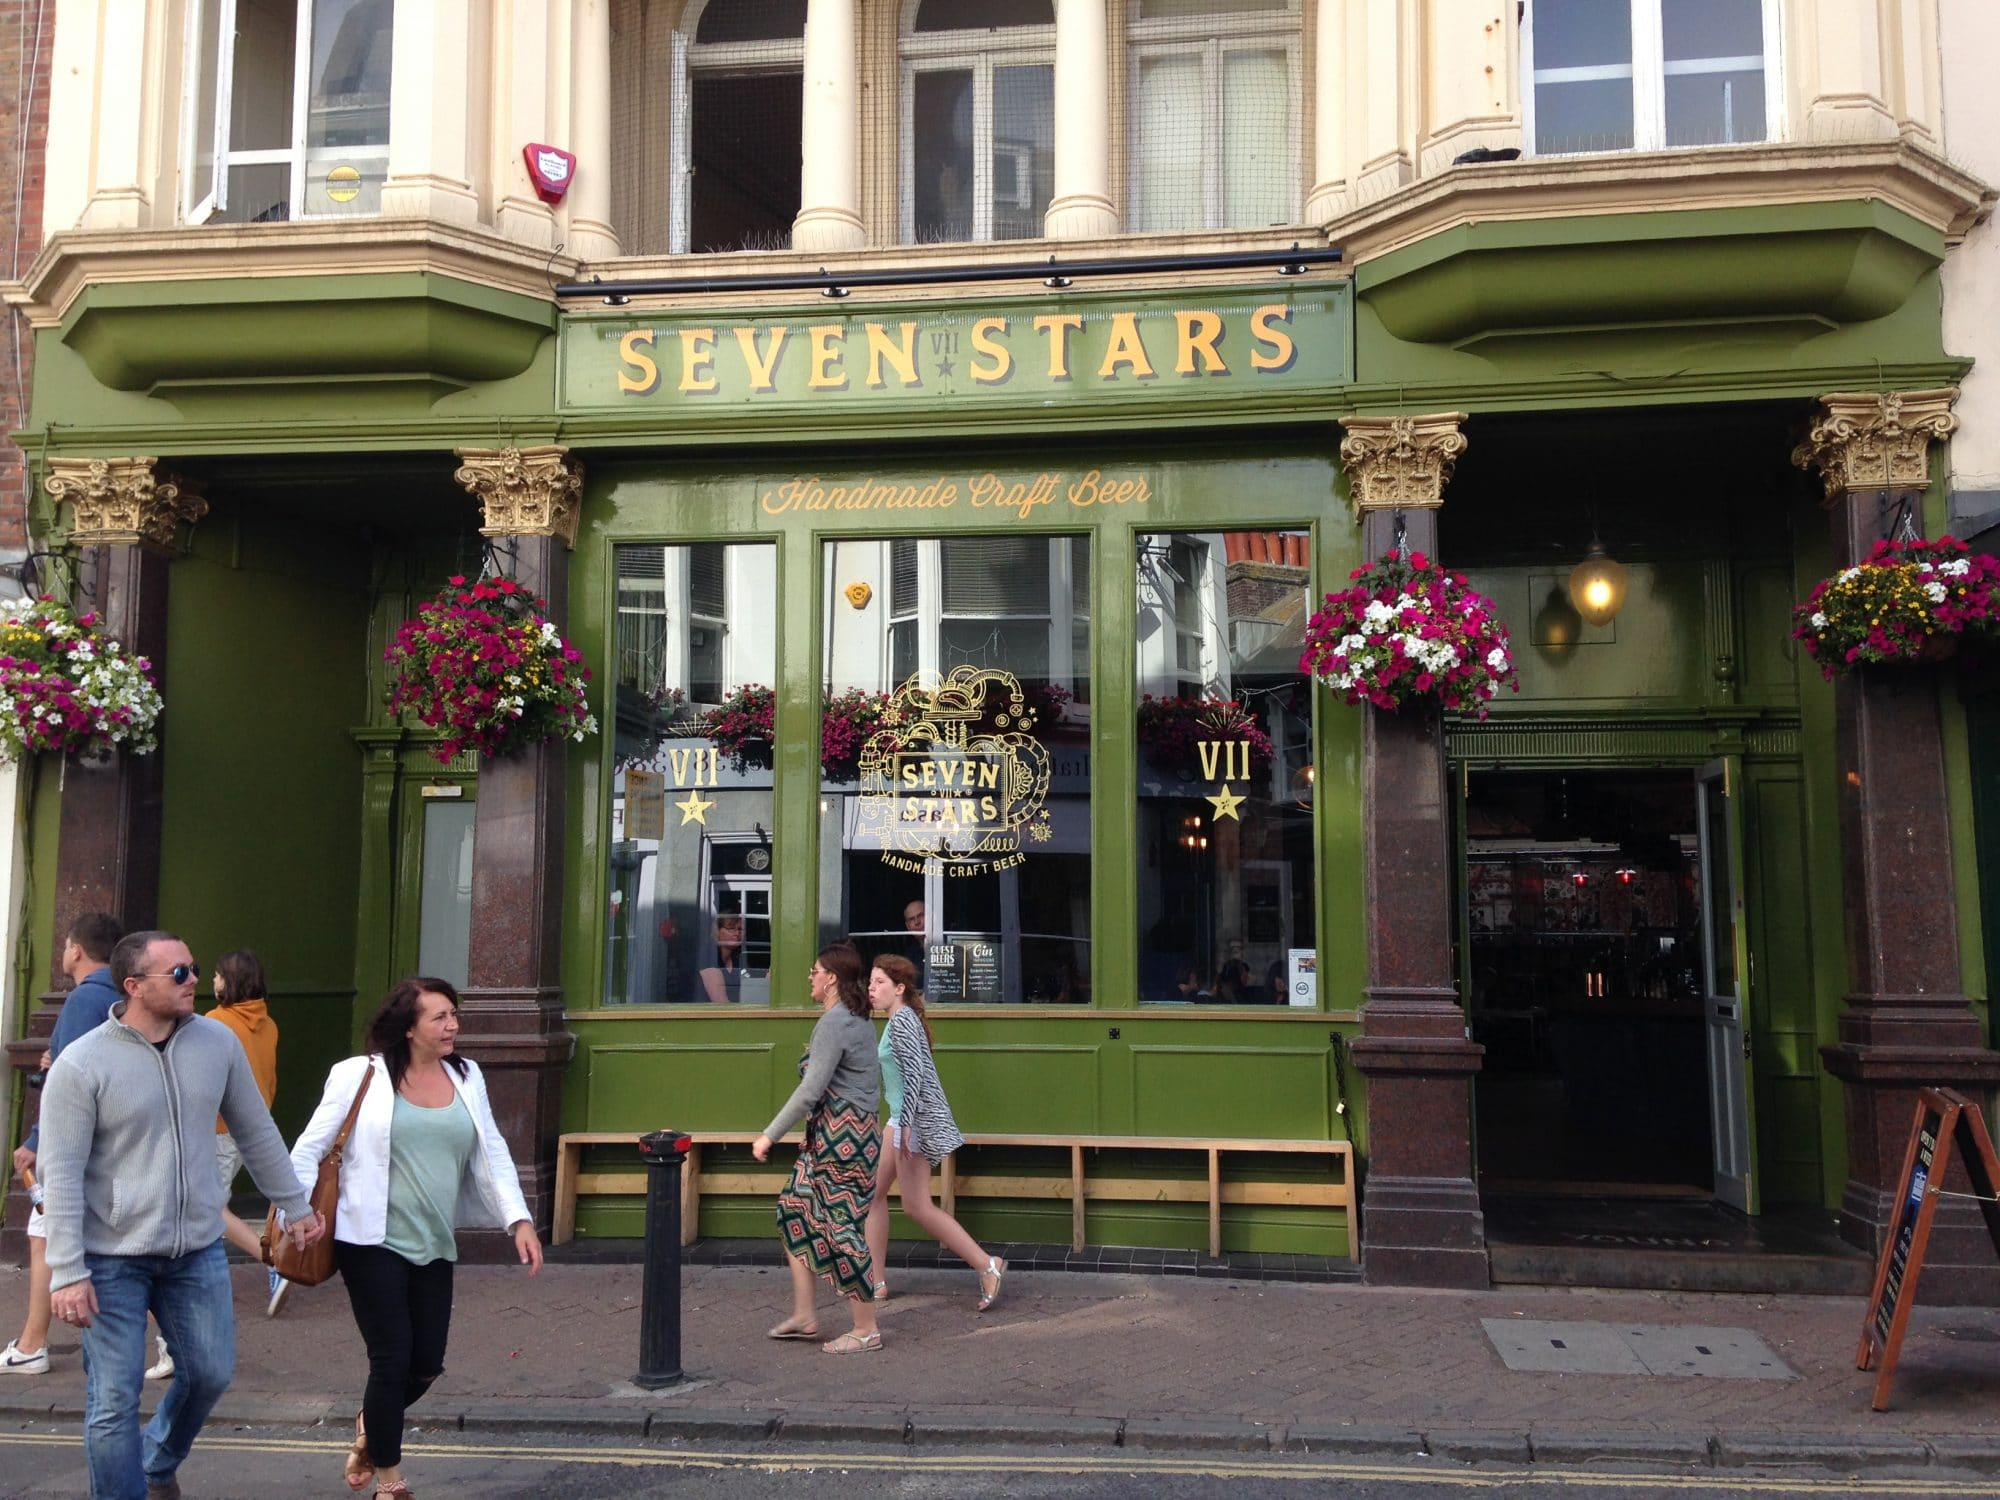 Seven Stars Best Pub Grub Brighton Restaurant Awards BRAVO, Gastro Pubs Brighton